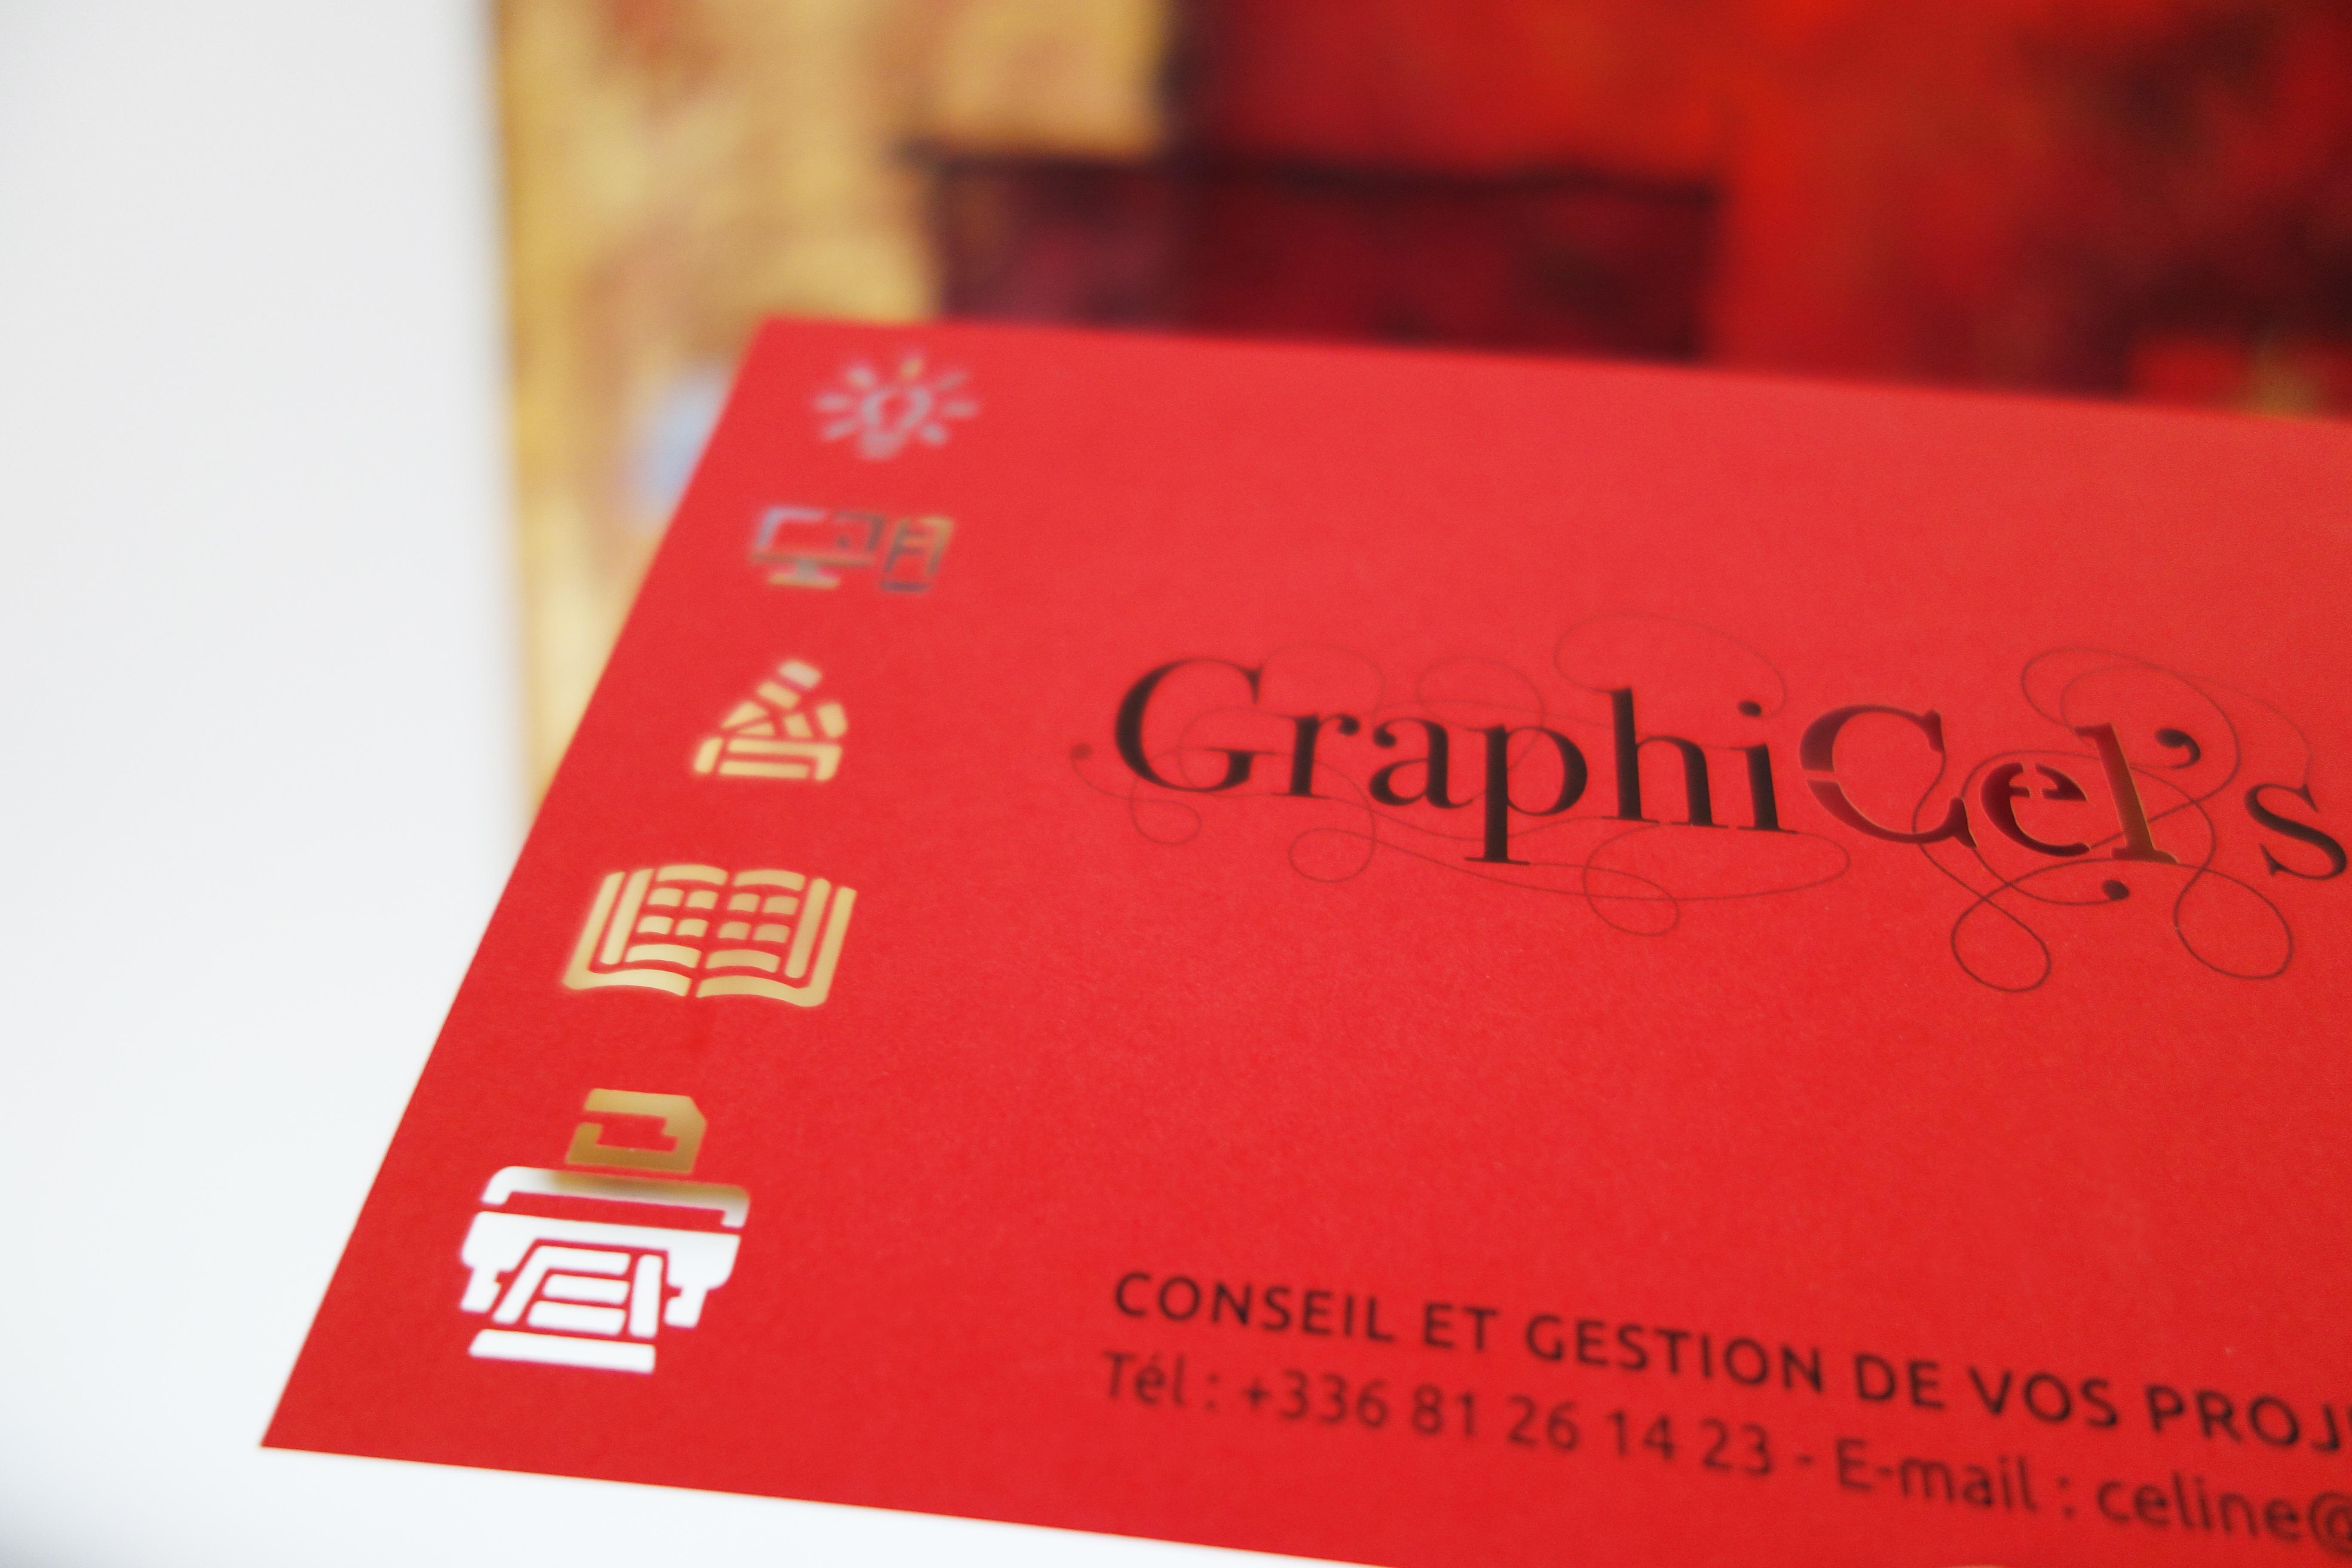 GraphiCel's